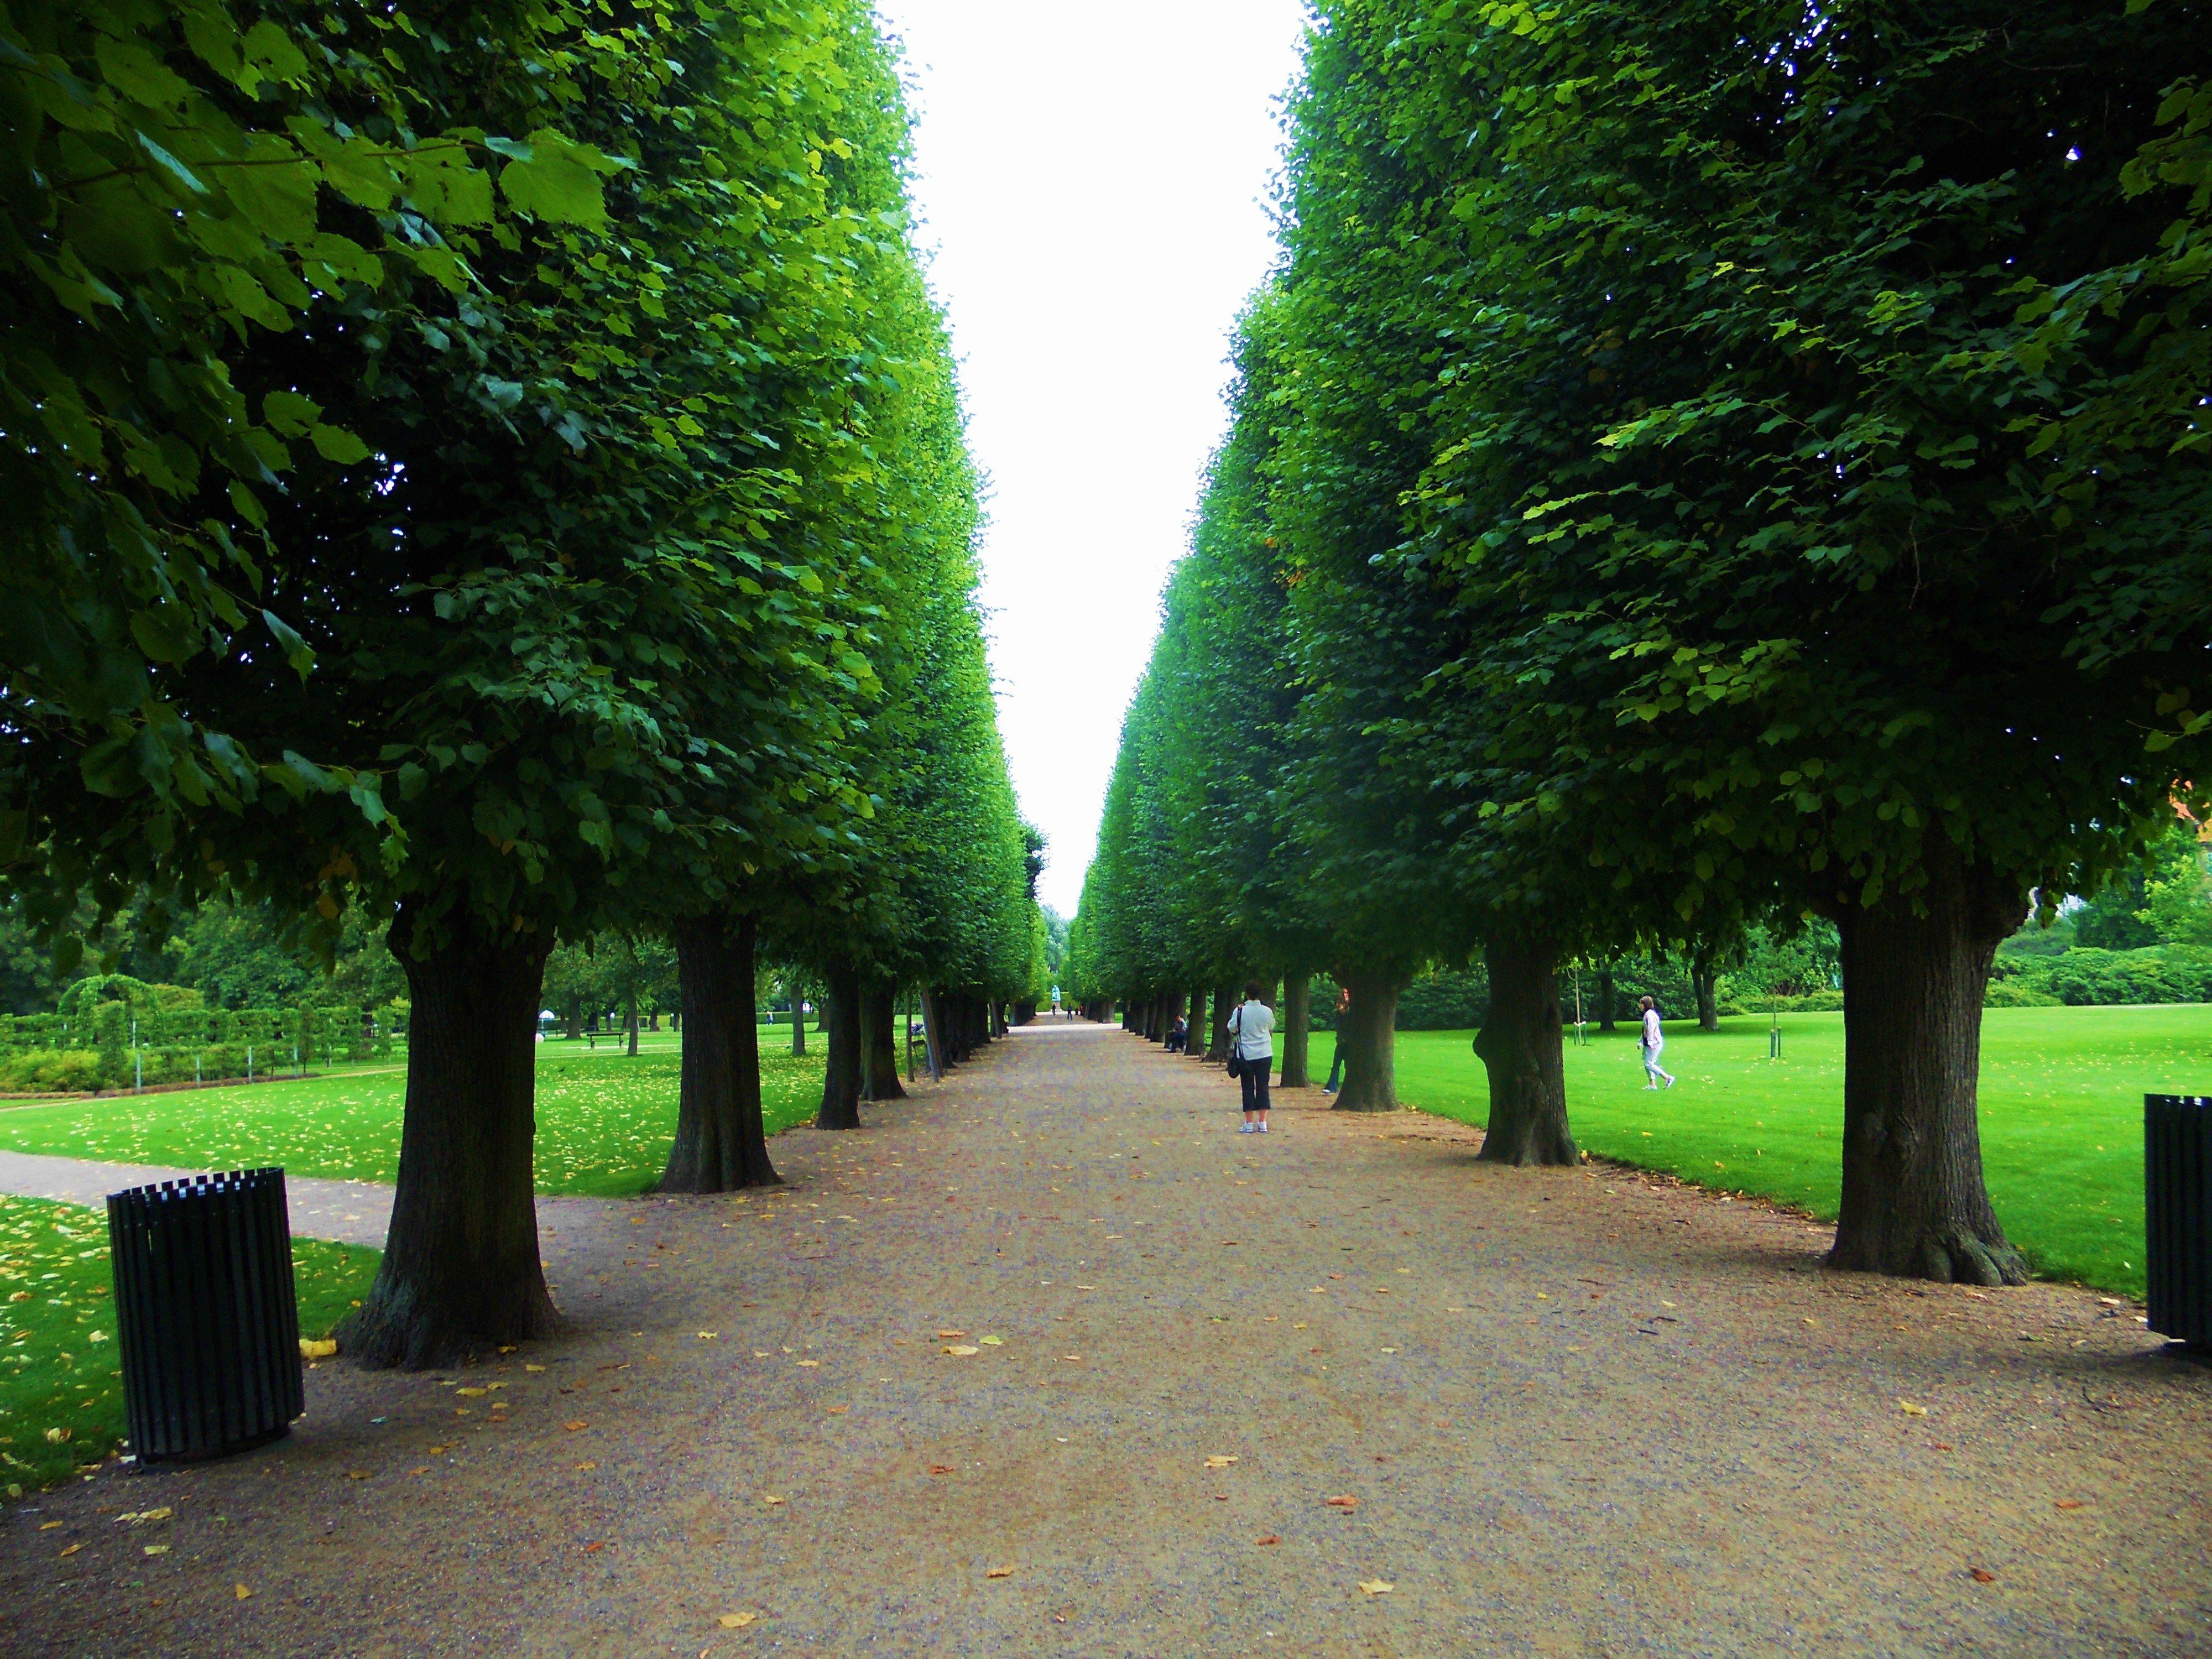 My favorite pathway in the King's Garden